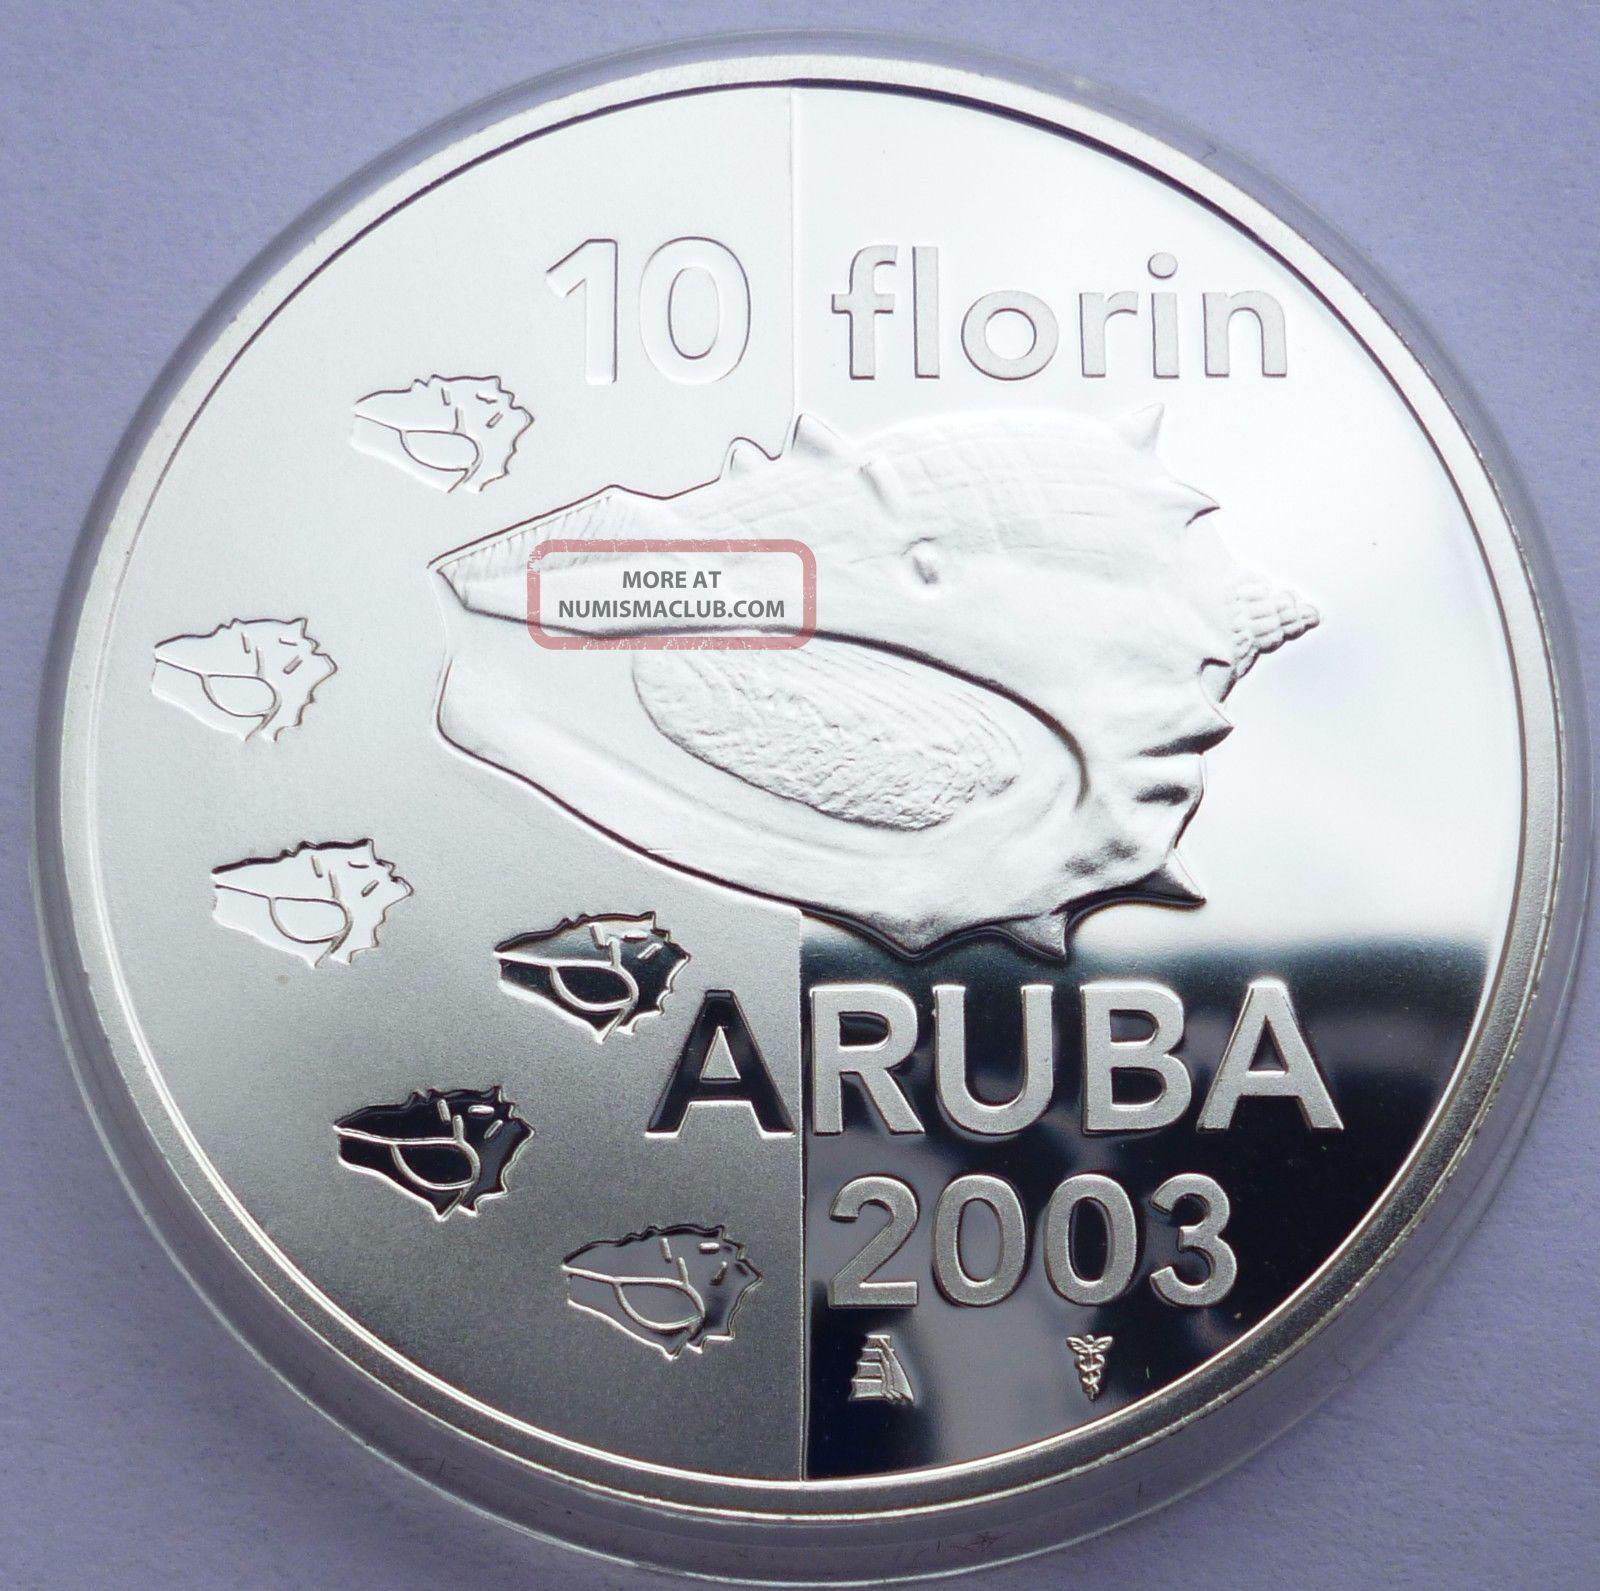 Aruba 10 Florin 2003 Silver Coin Proof Sea Shell Very Low Mintage Rare